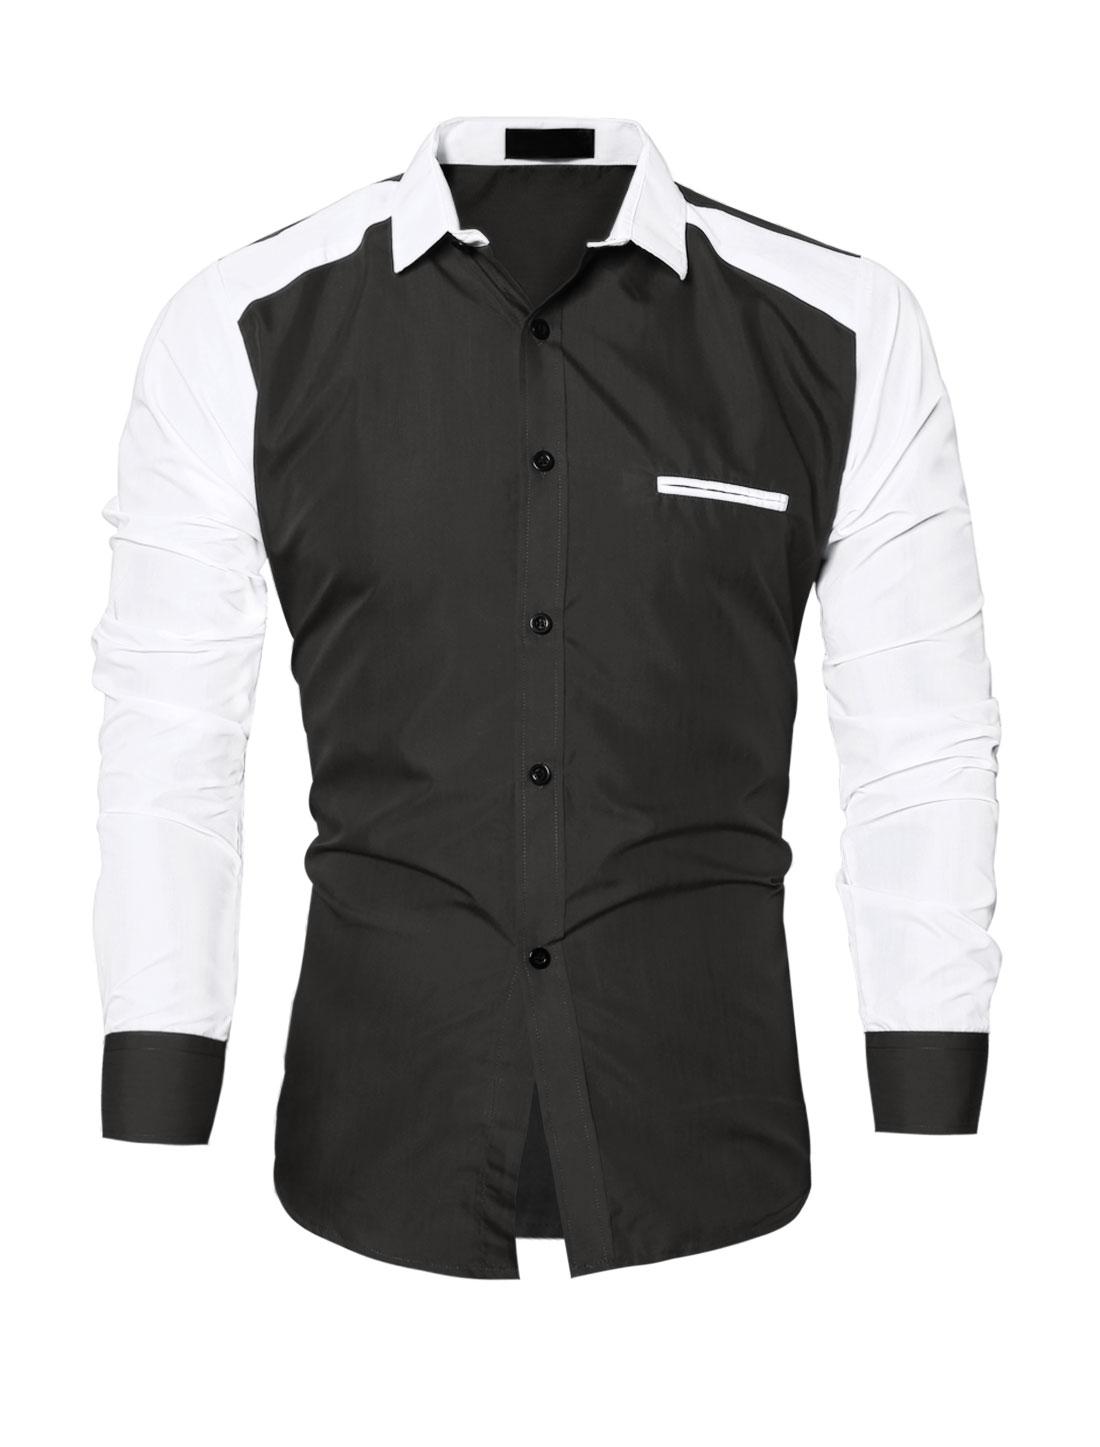 Men Collared Contrast Color Slim Fit Shirt Black M